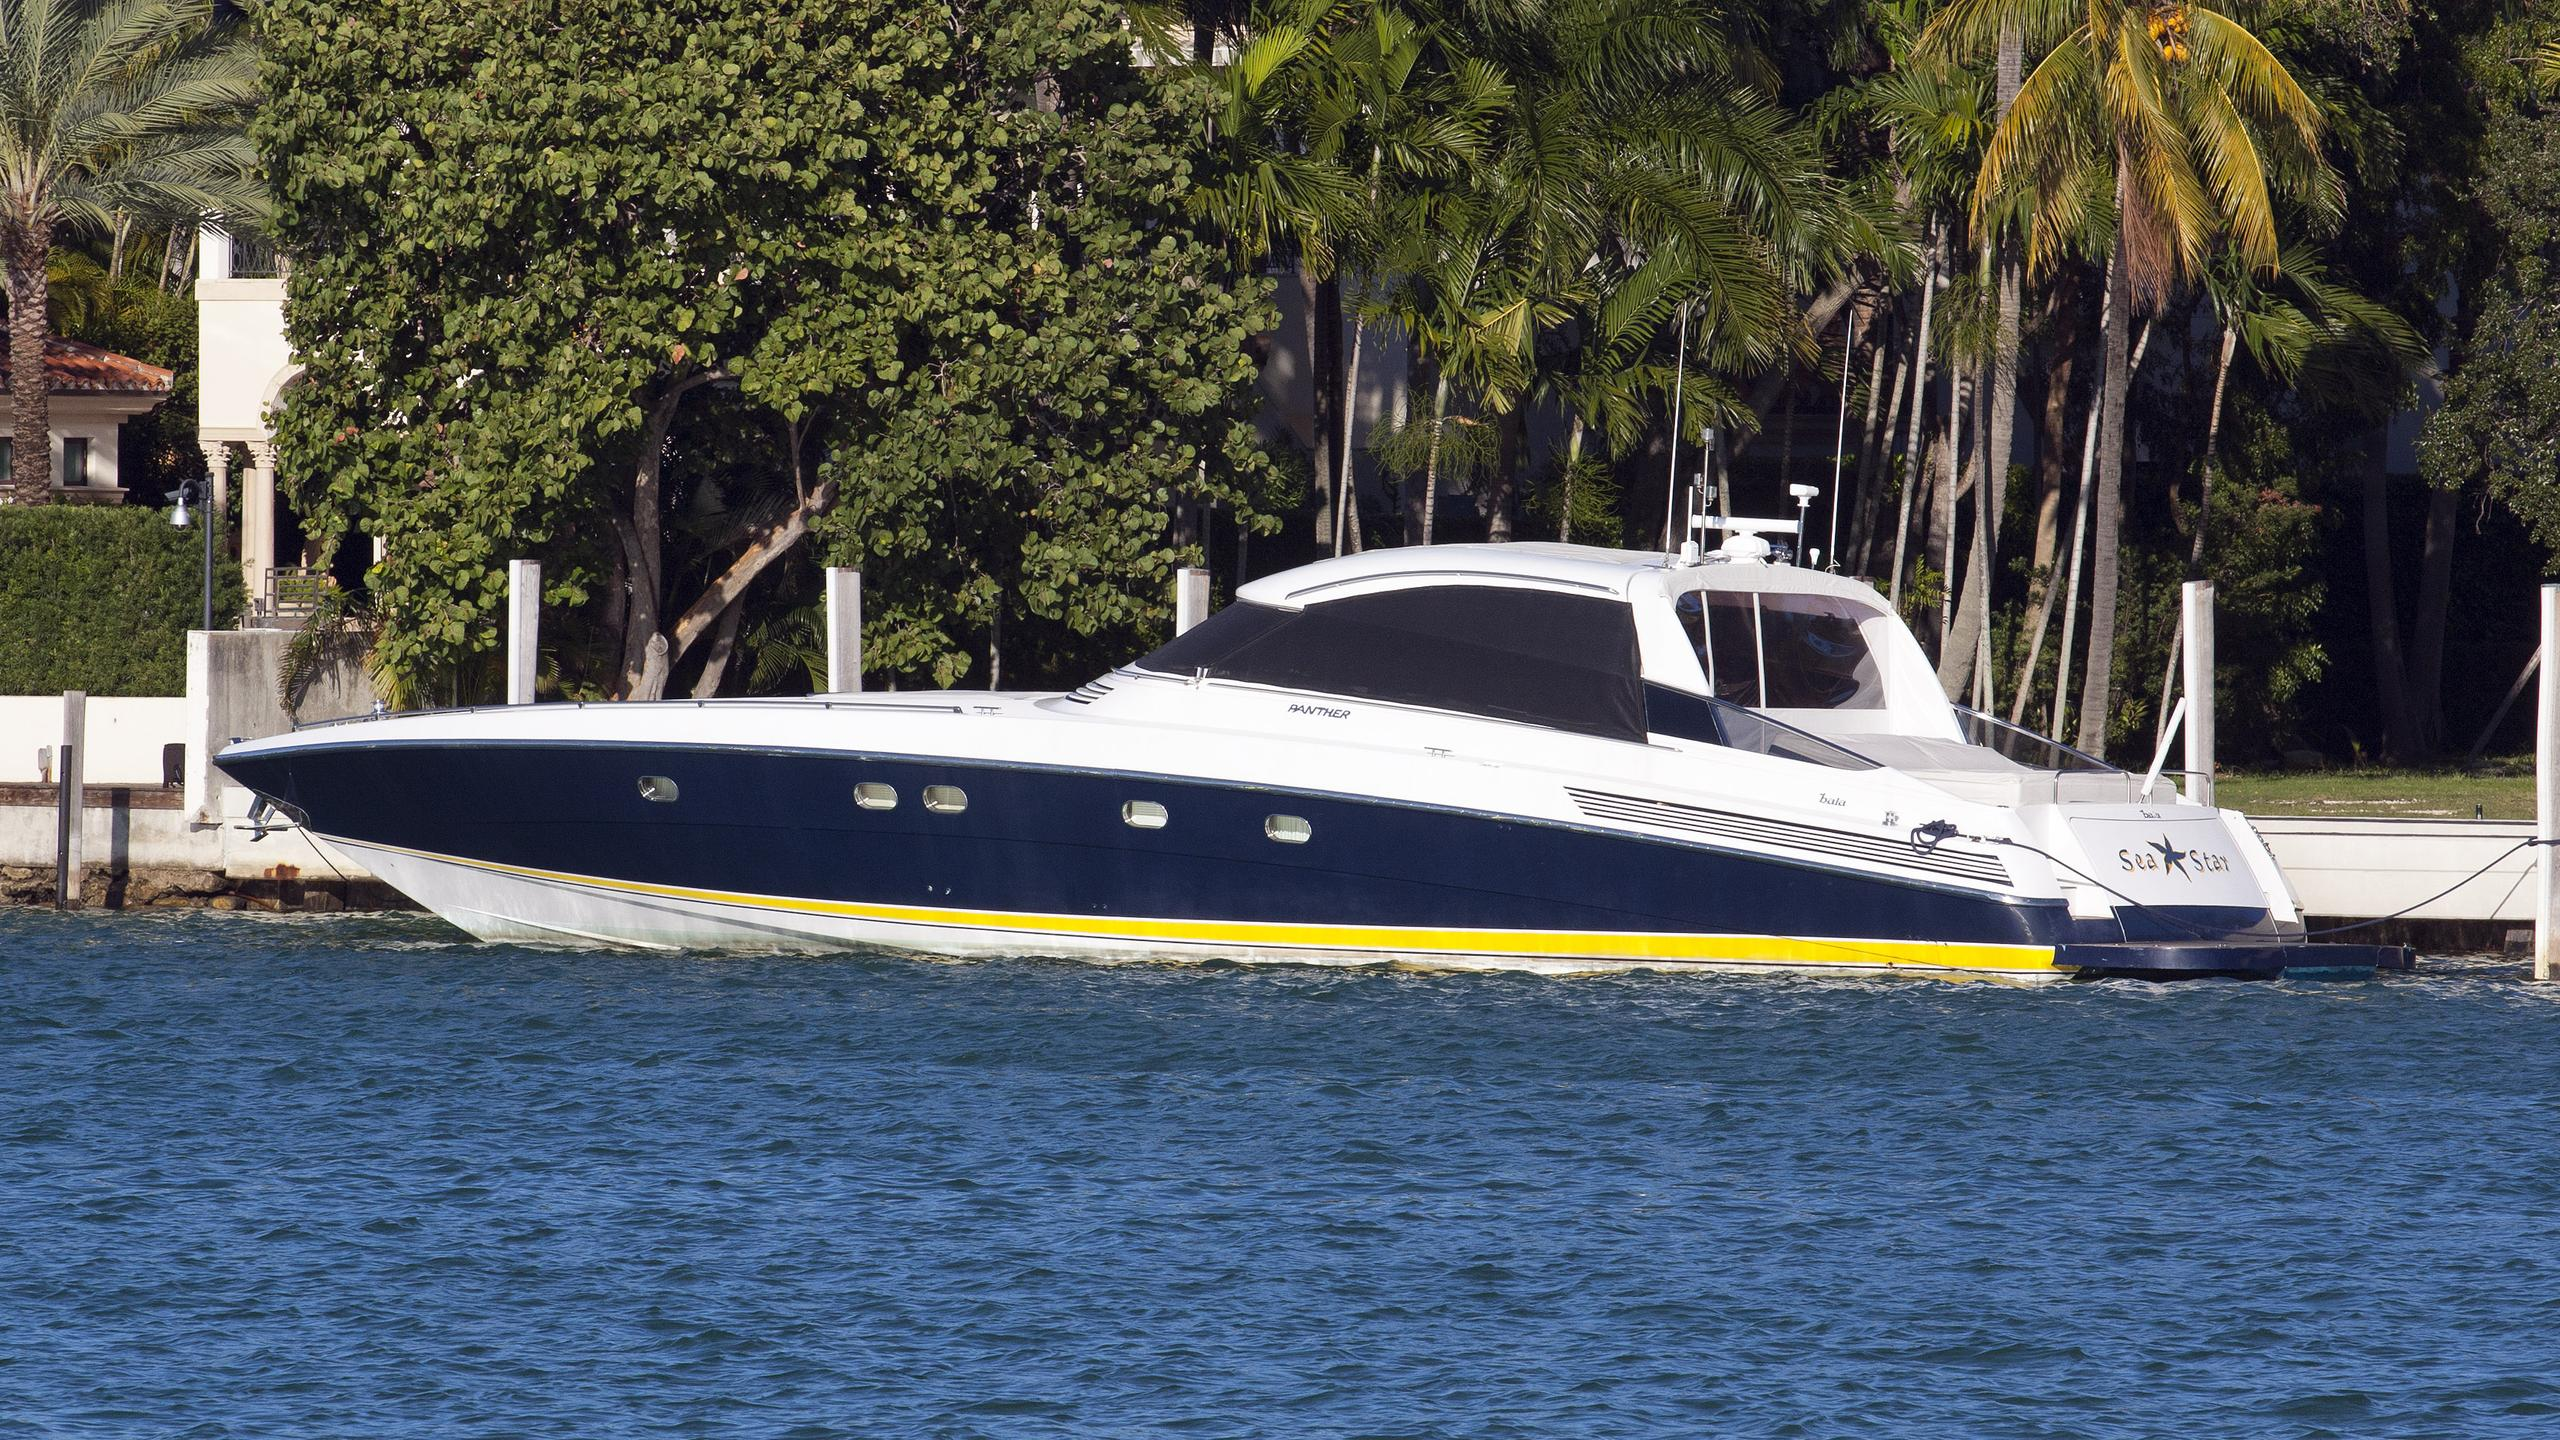 sea-star-motor-yacht-baia-1999-25m-berth